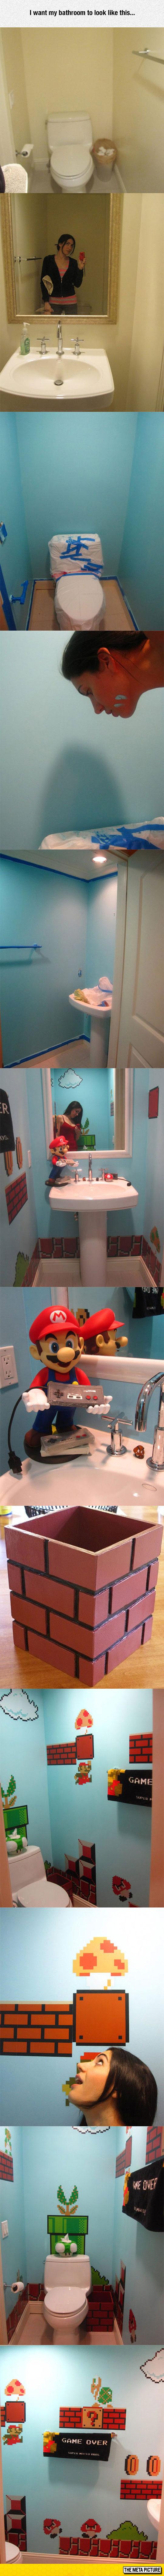 A Bathroom Like This